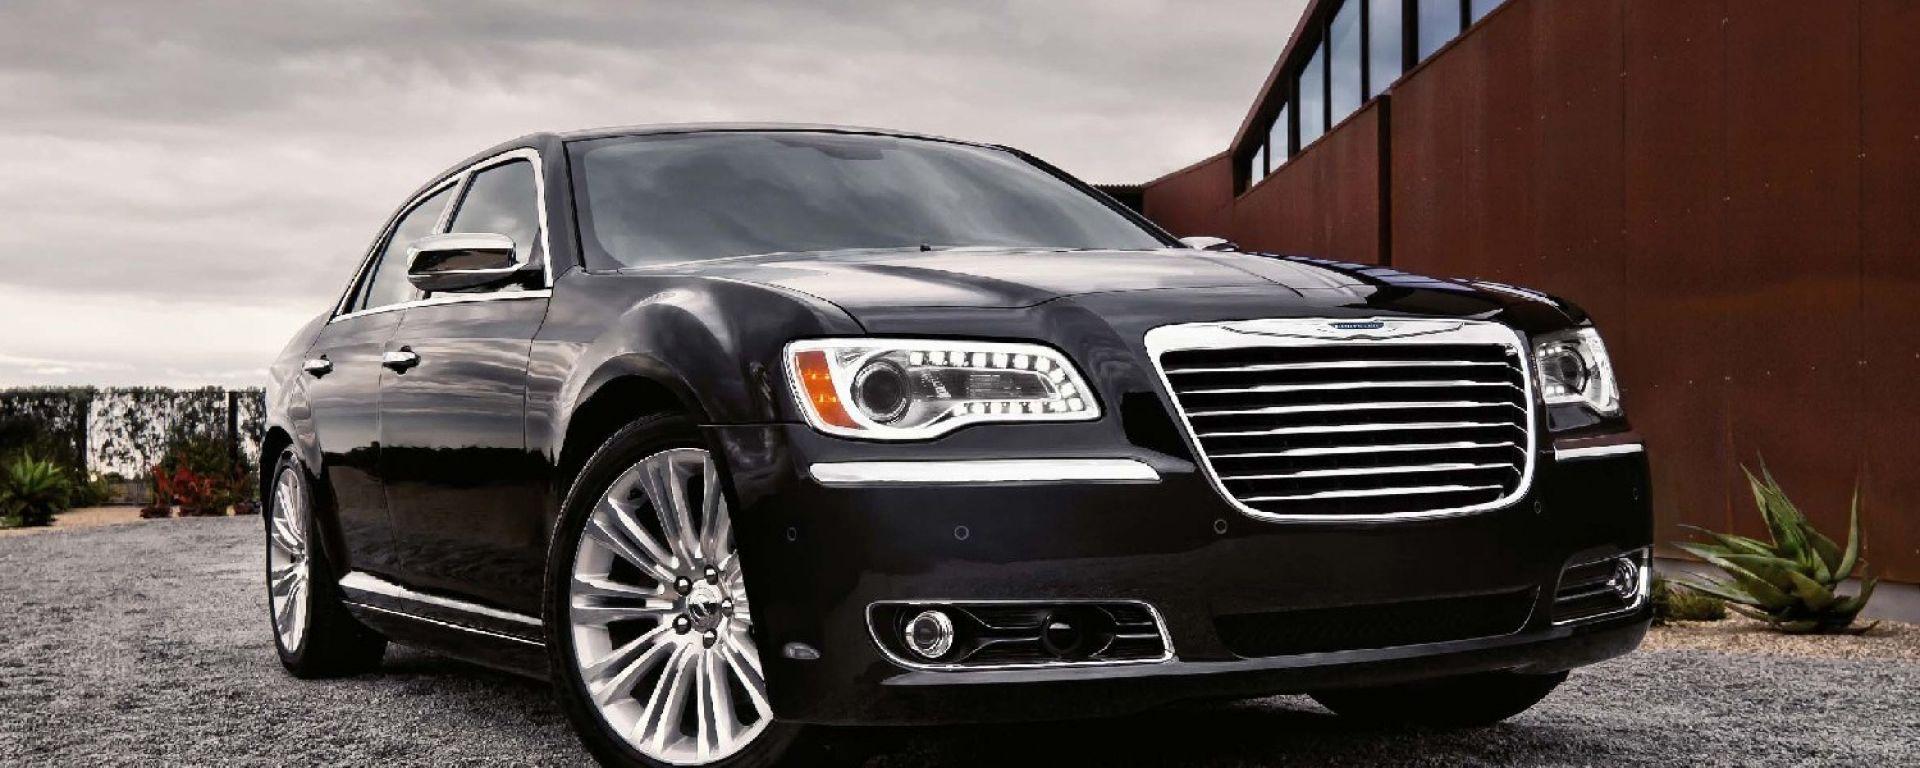 La Chrysler 300C 2011 in 40 nuove immagini